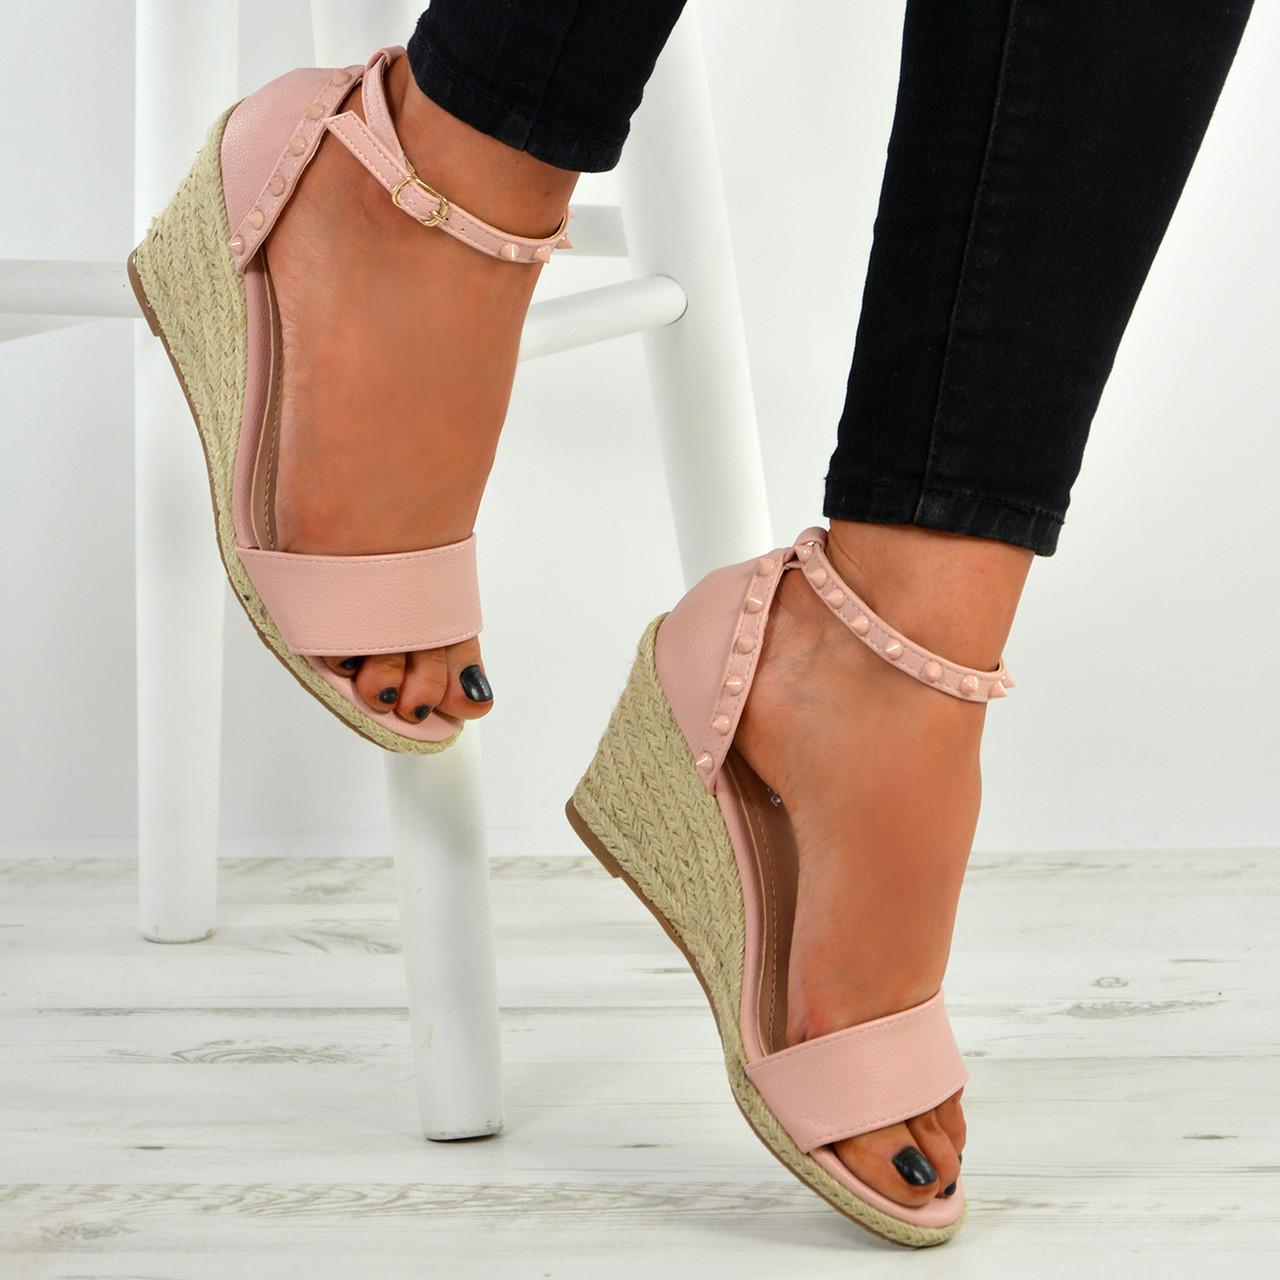 07e1140c5ce New Womens Ladies Rock Studs Peep Toe Espadrille Wedge Platforms Sandals  Shoes